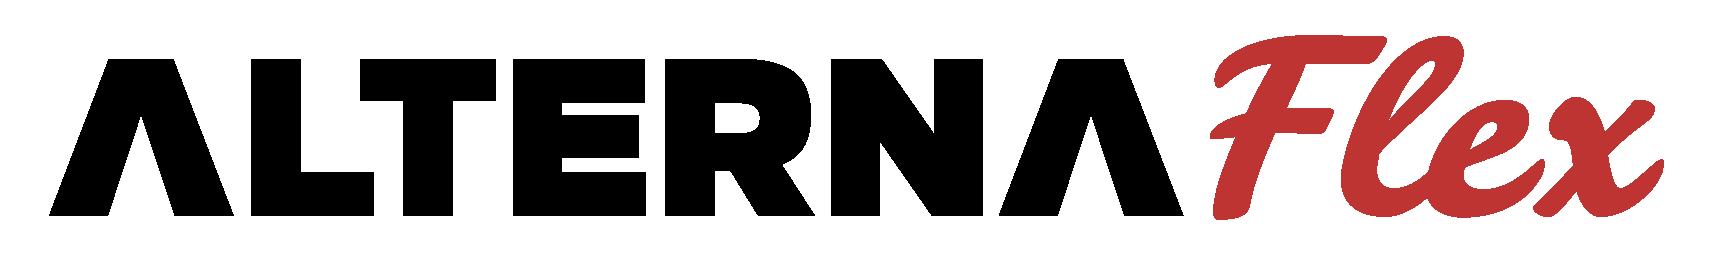 Alternaflex - L'alternance flexible - logo